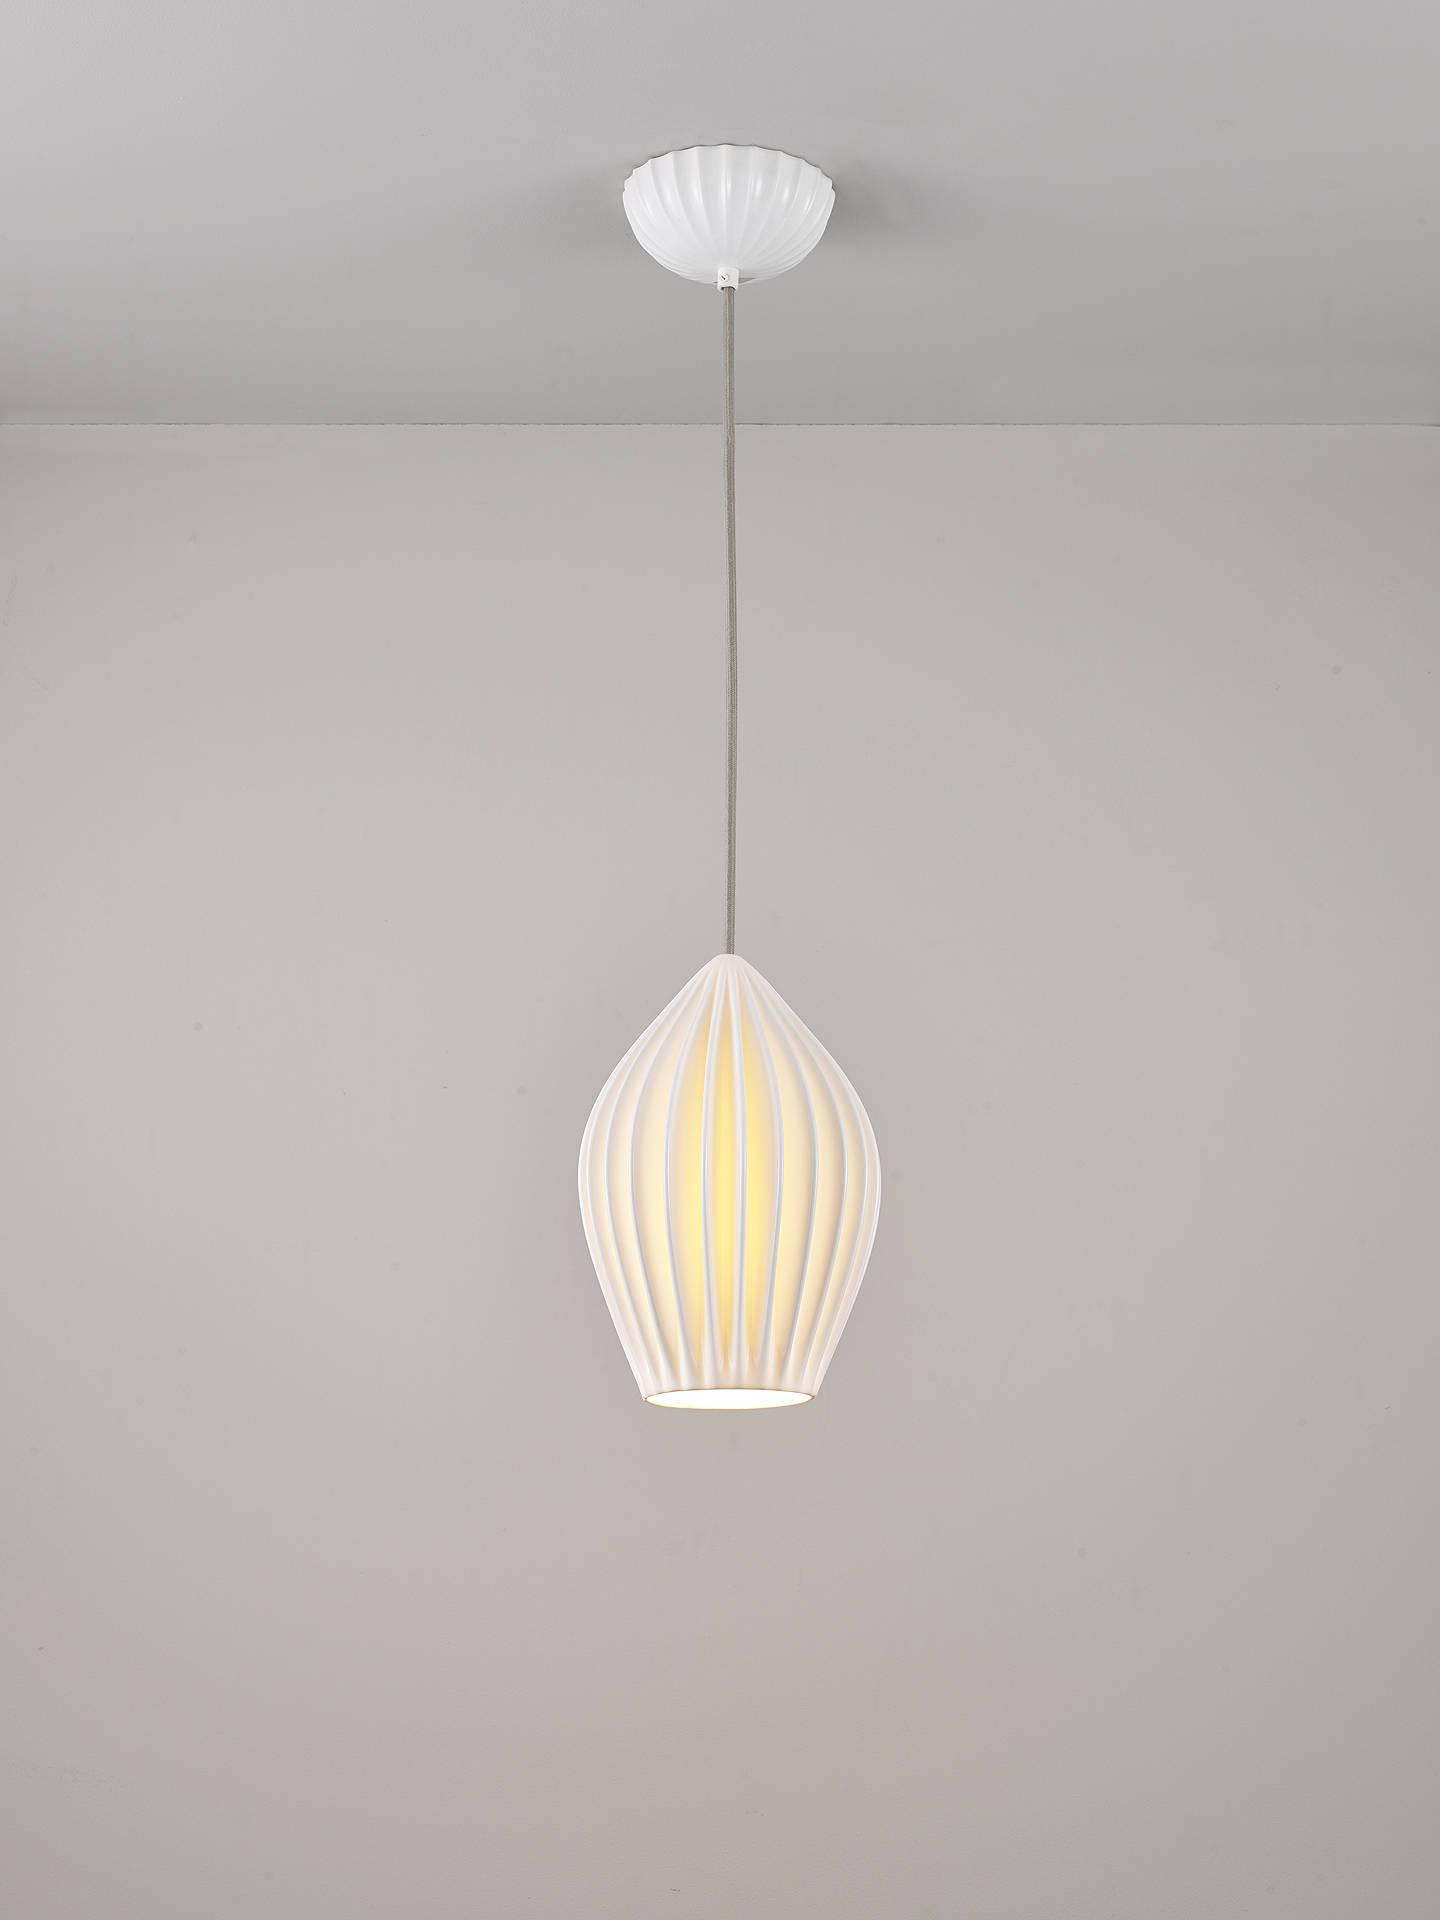 Original Btc Fin Large Pendant Light White Online At Johnlewis